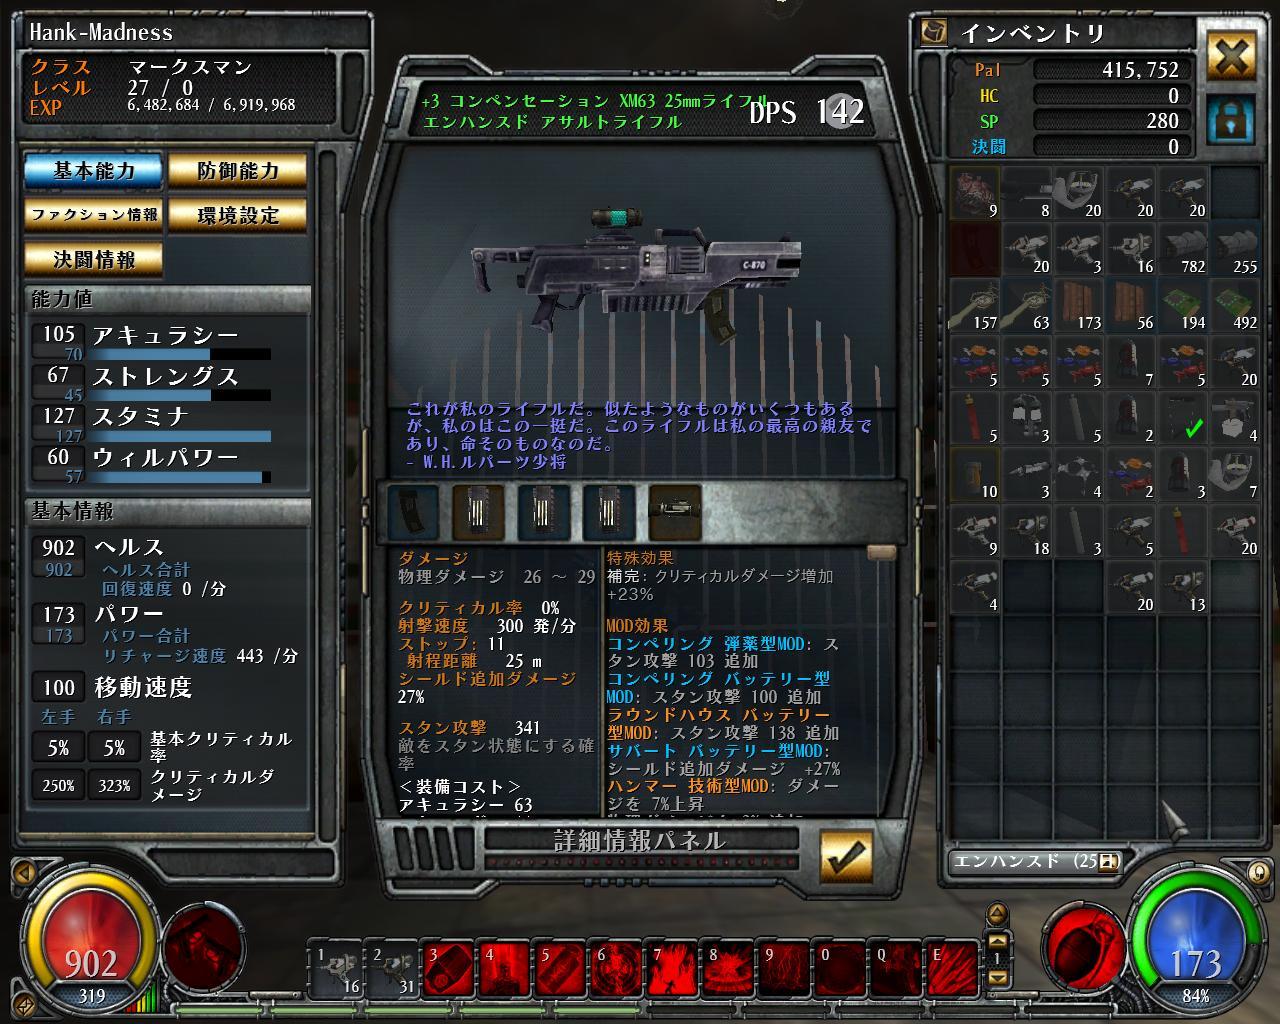 Hellgate_2010_12_20 22_47_06